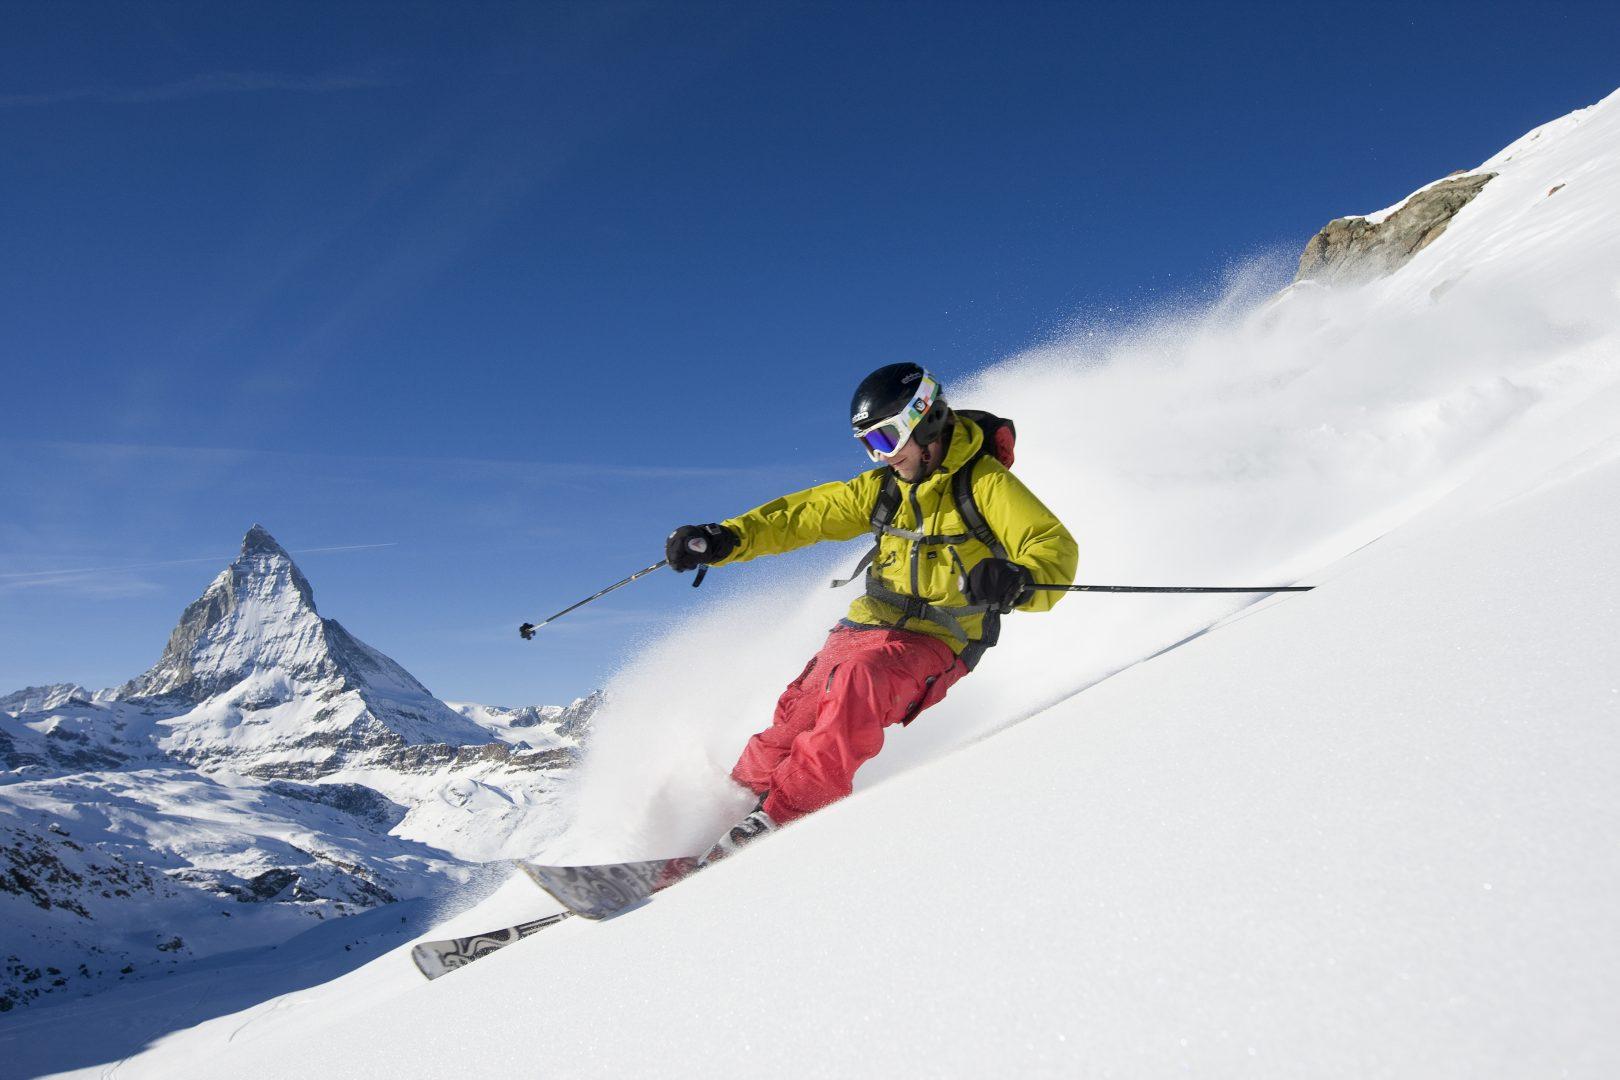 In mod ideal ar trebui sa te antrenezi cu 12 saptamani inainte de a pleca in vacanta de schi. Pregateste-te treptat prin exercitii fizice,